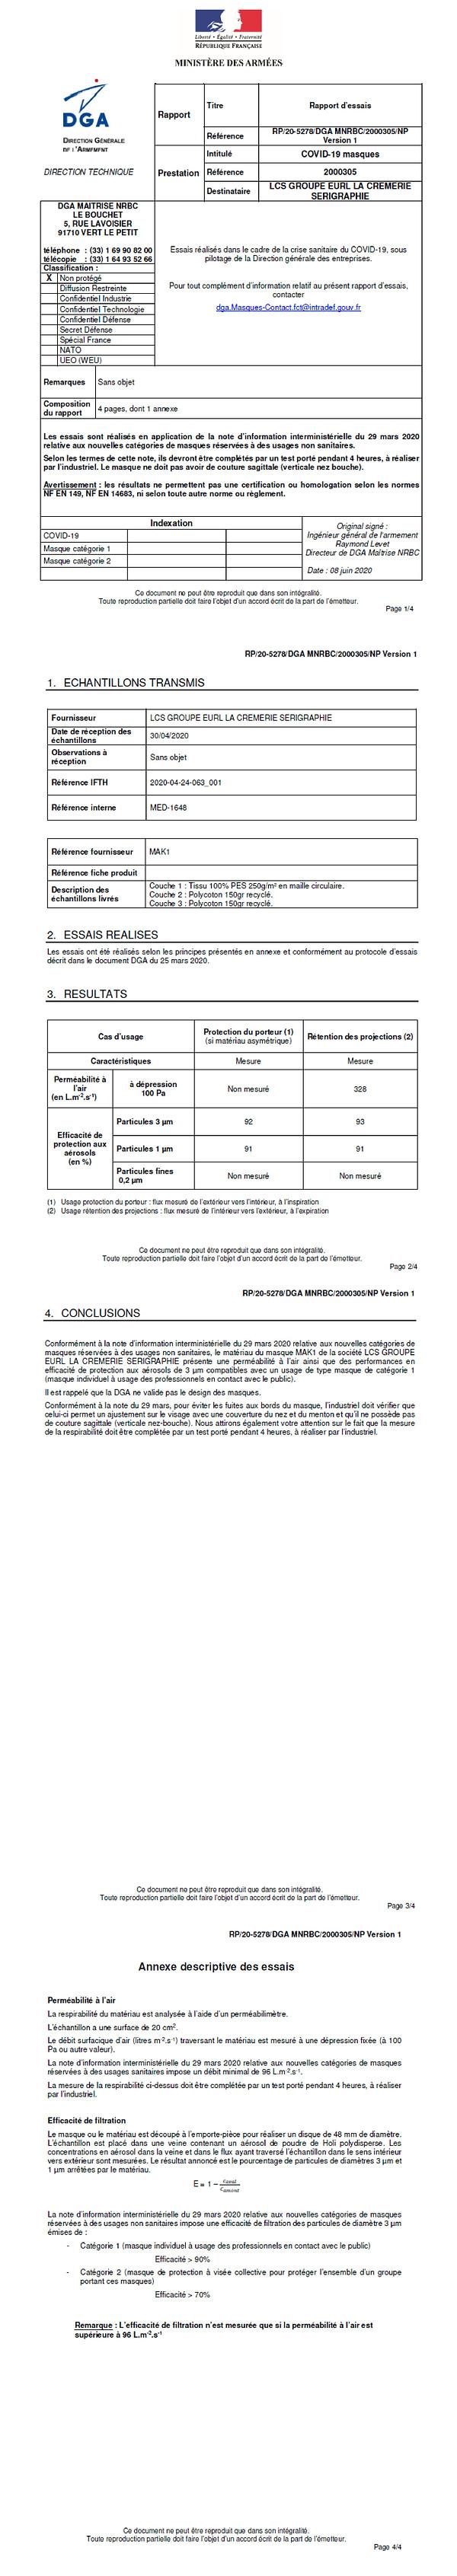 Rapport 5278-01.jpg